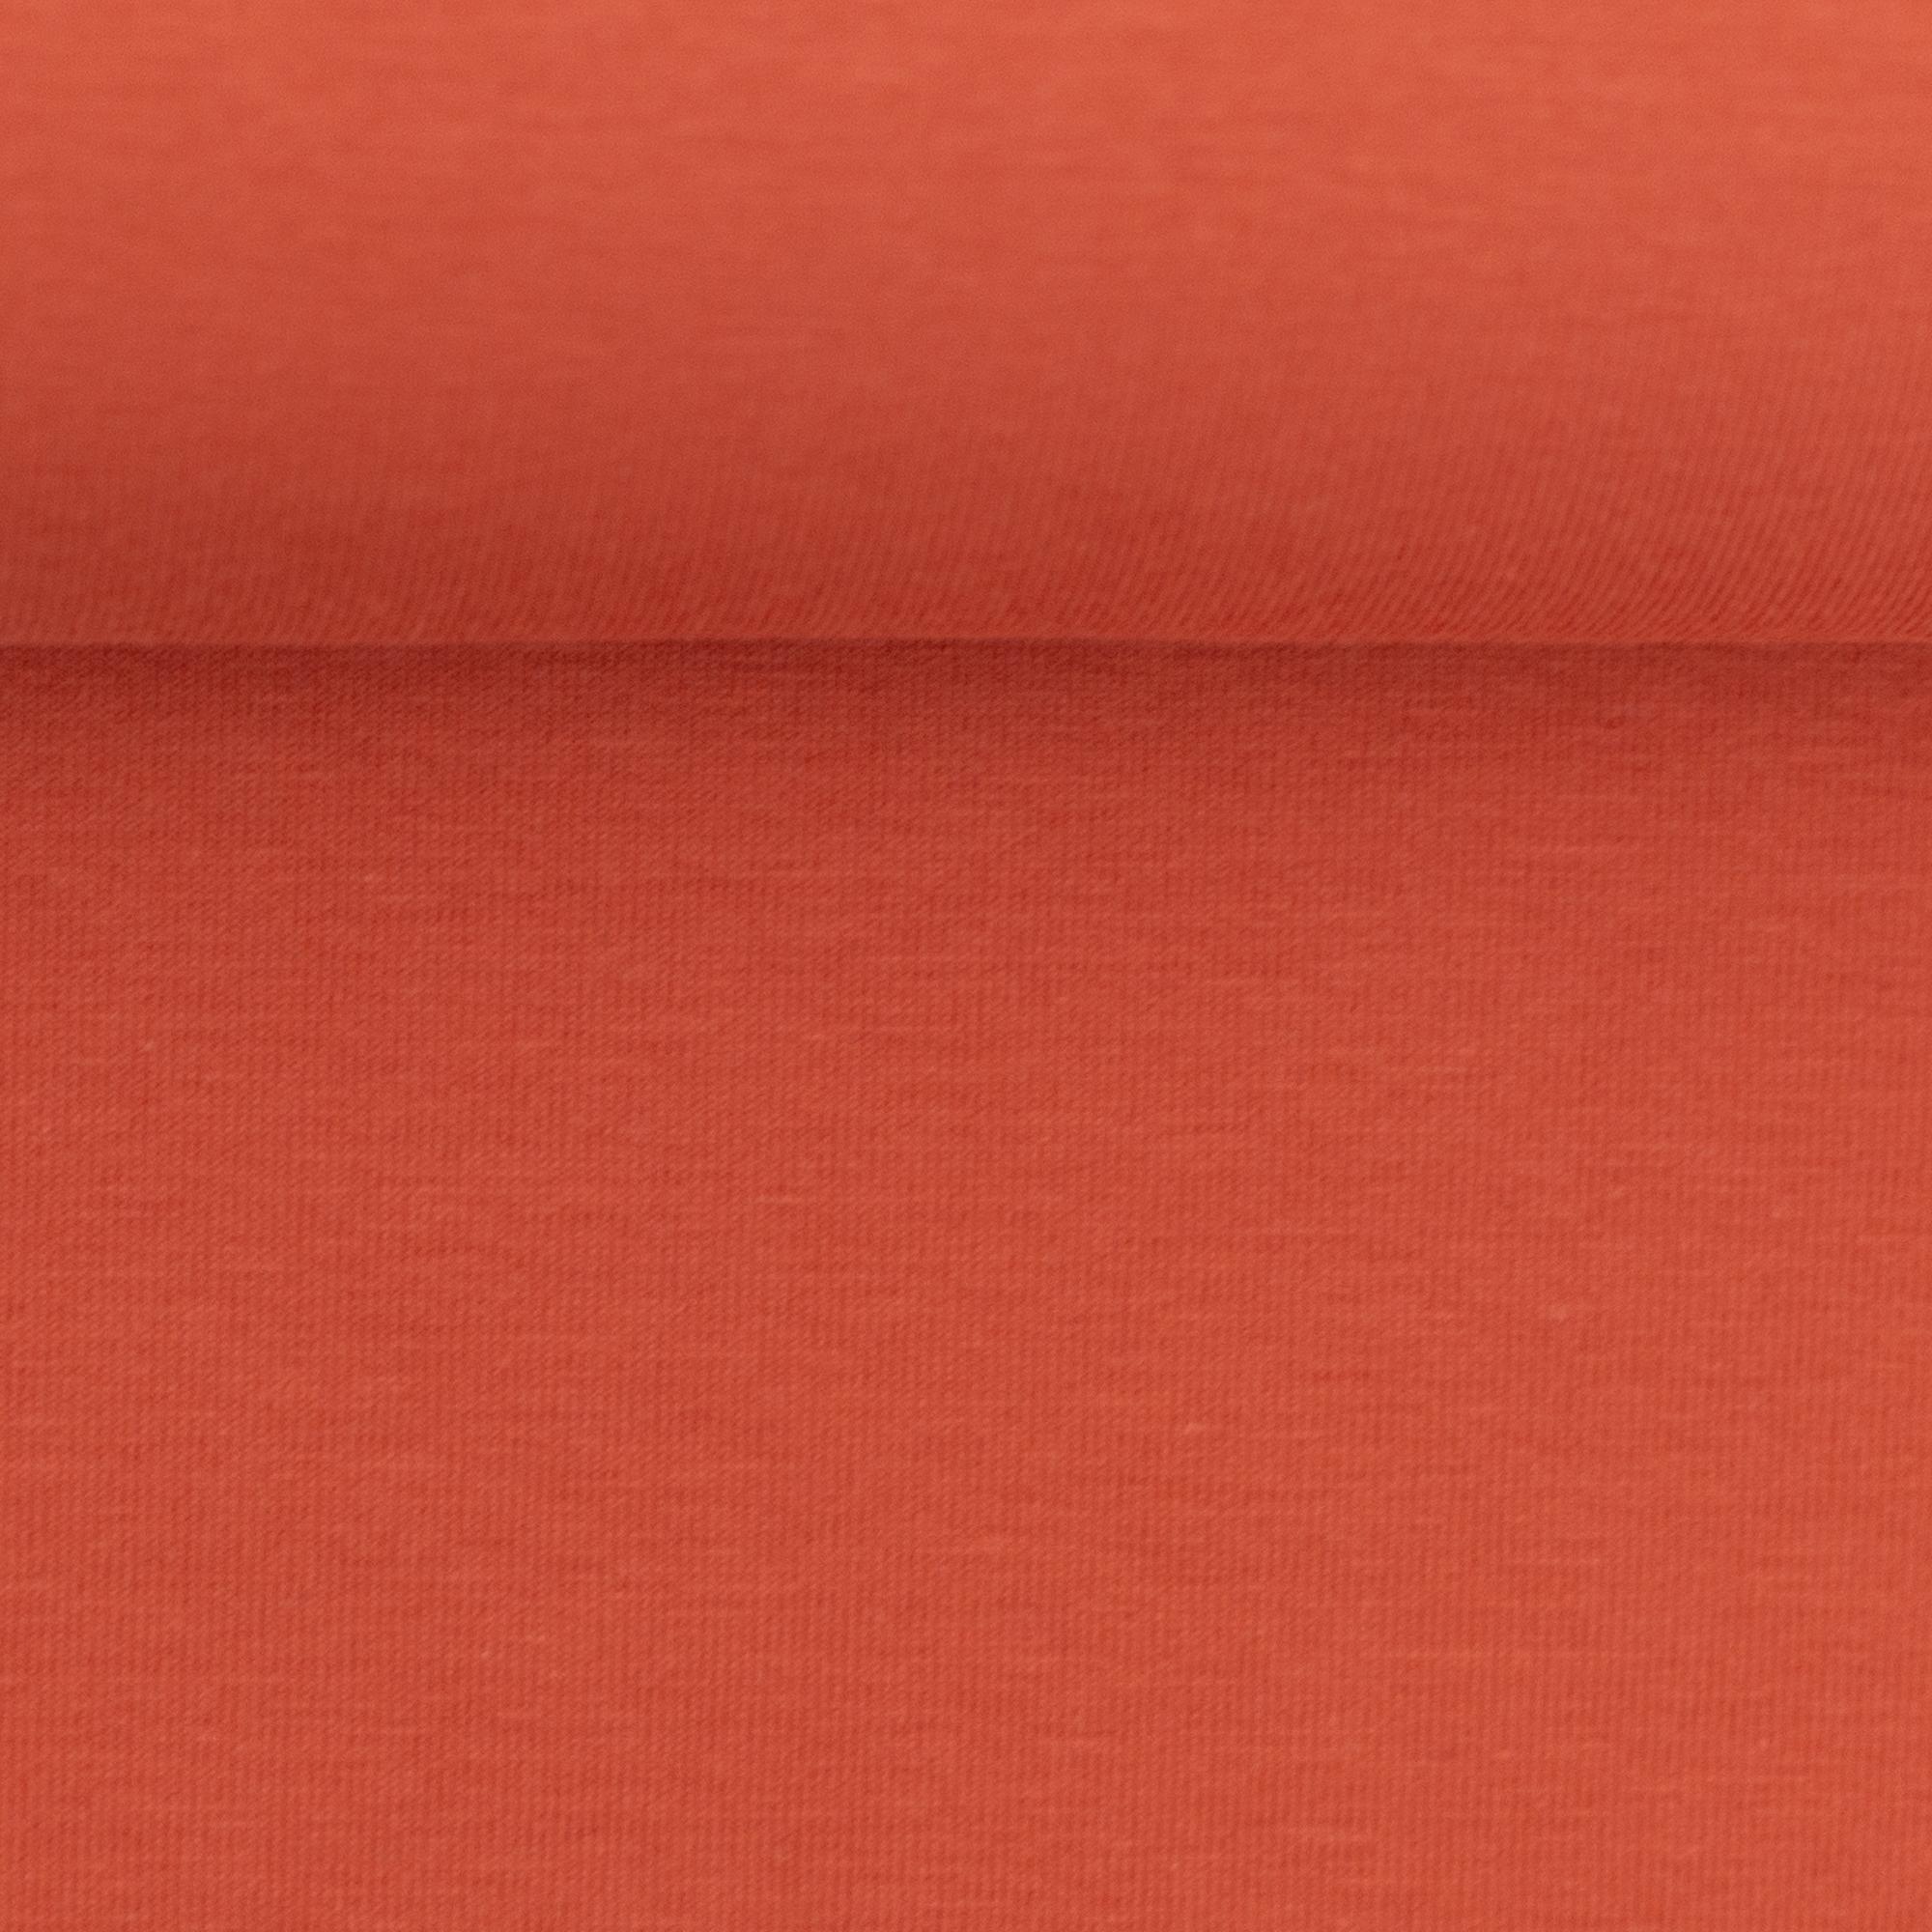 Baumwoll Jersey - Jersey Stoff - Swafing - Vanessa - Uni - Orange